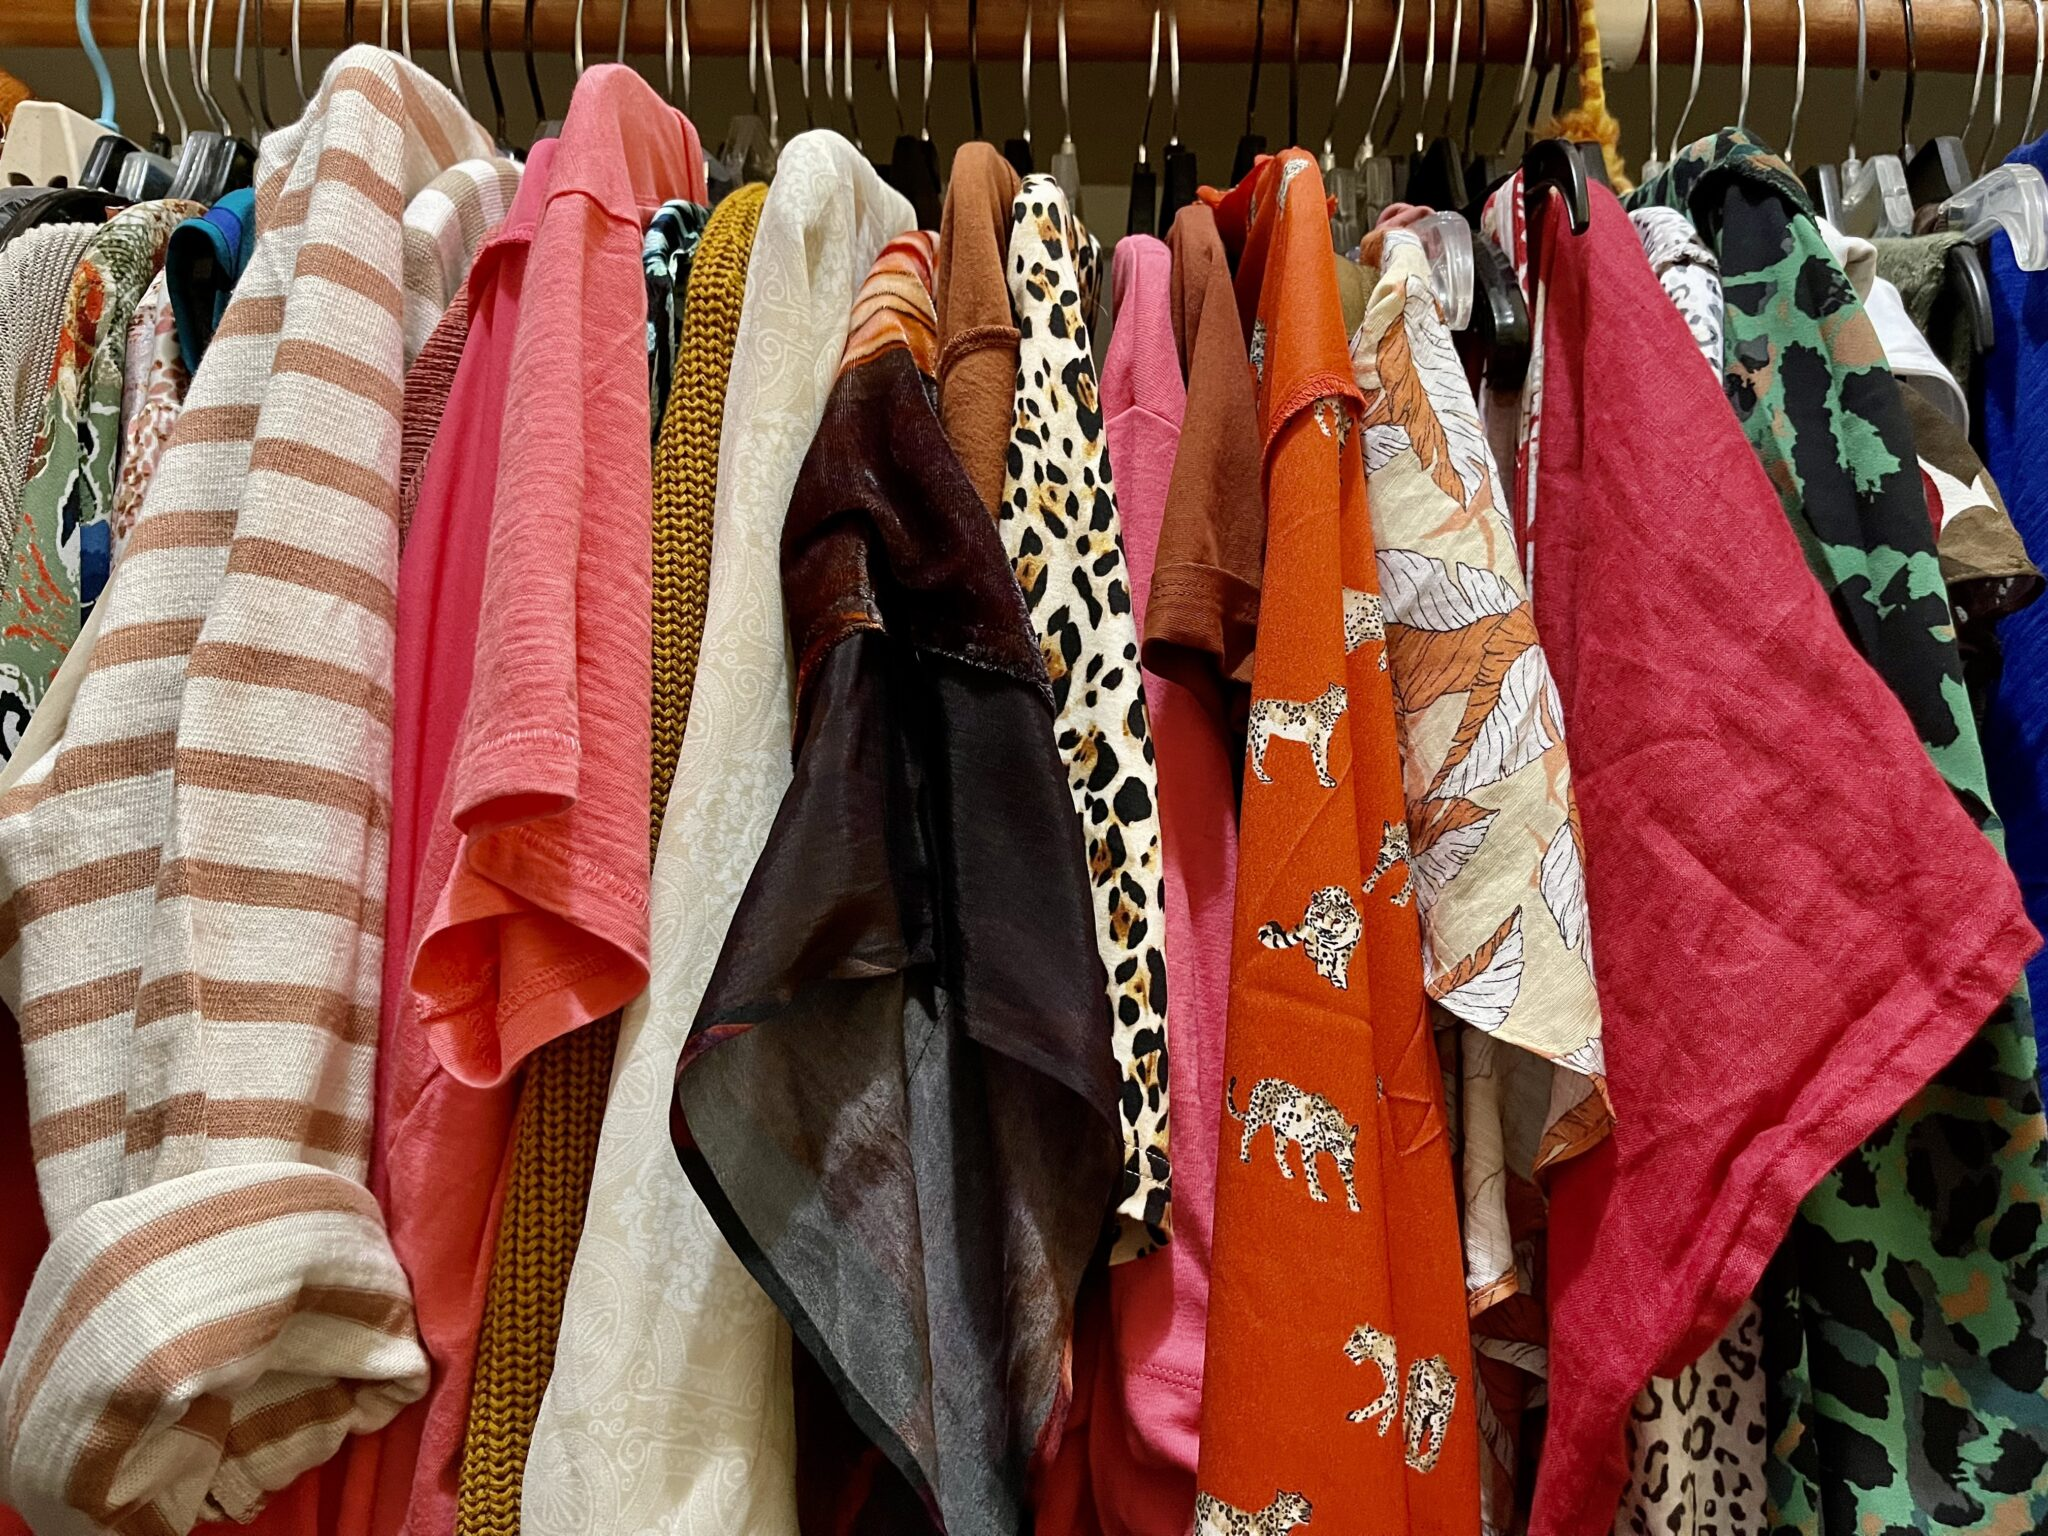 Style Refresh 2021: Closet Reorganization Begins